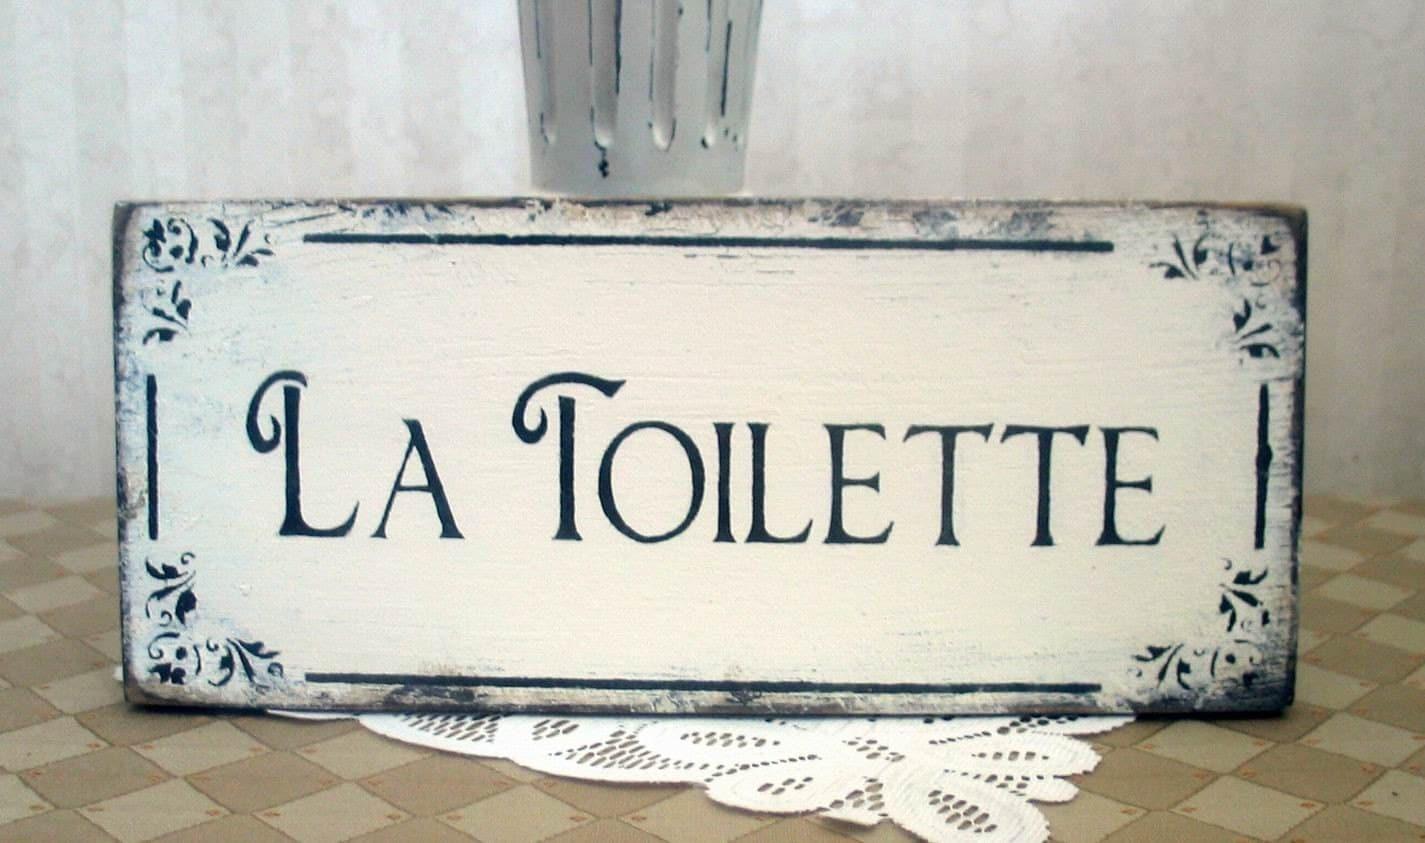 la toilette bath sign wooden vintage styled shabby rustic. Black Bedroom Furniture Sets. Home Design Ideas